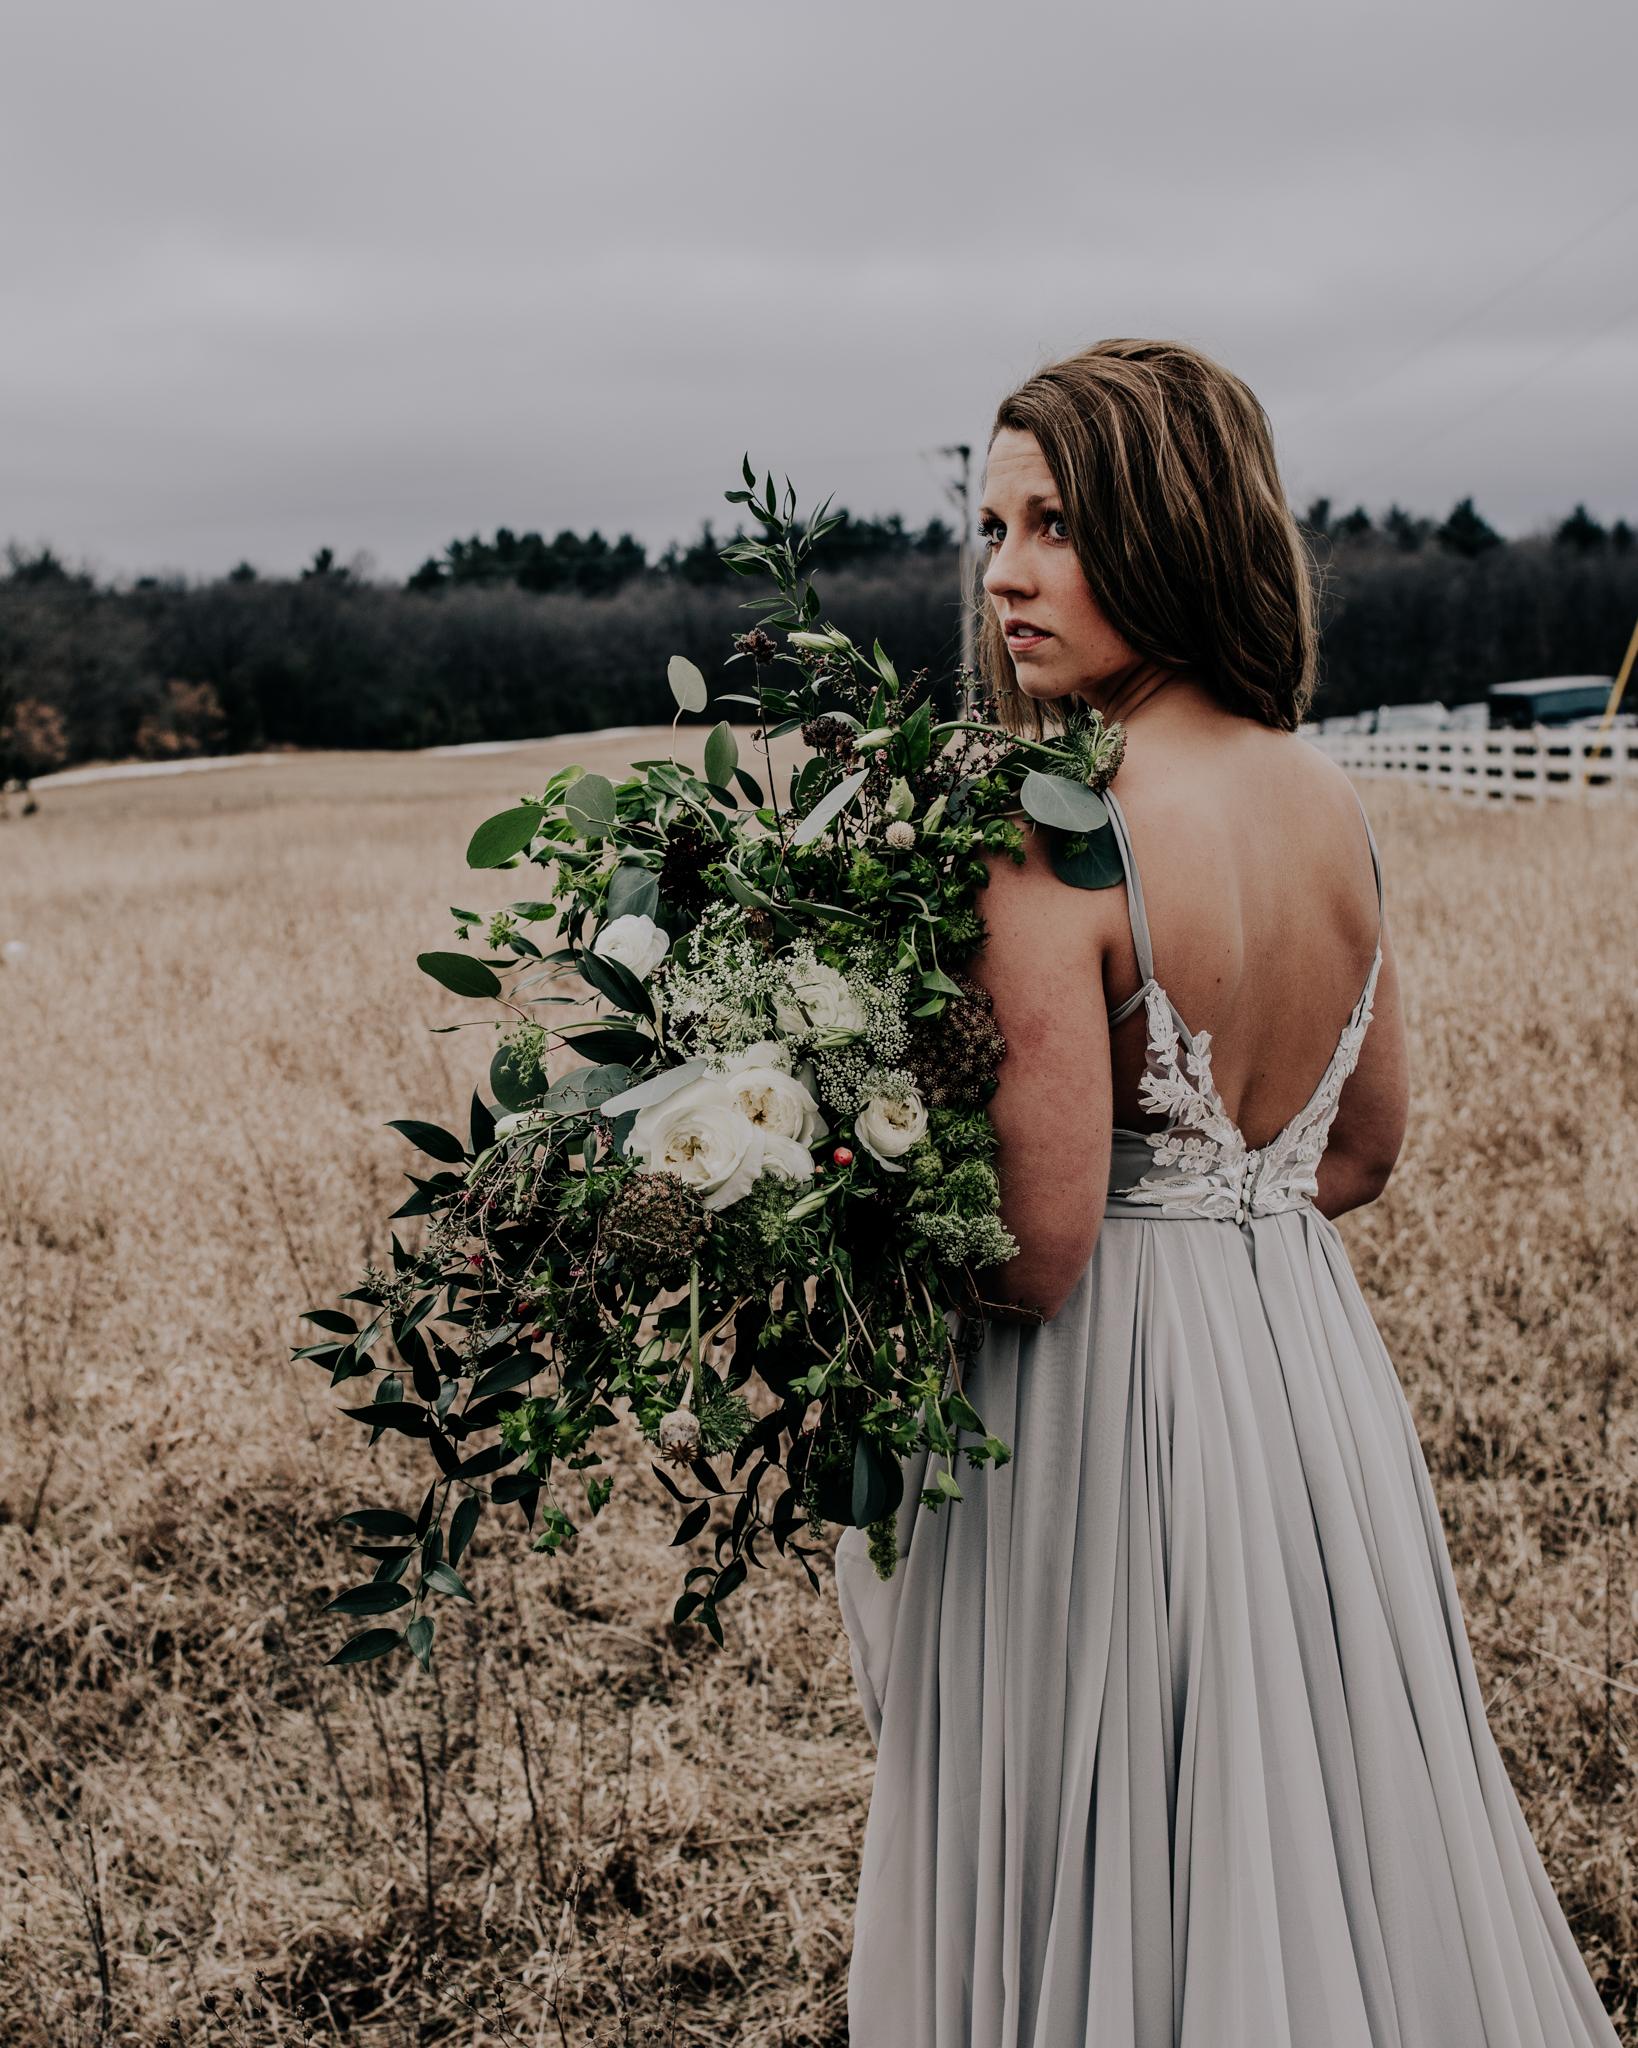 Jennifer Joyce Design - Florals - Green Bouquet - Lace Back Wedding Dress - Hove Photography